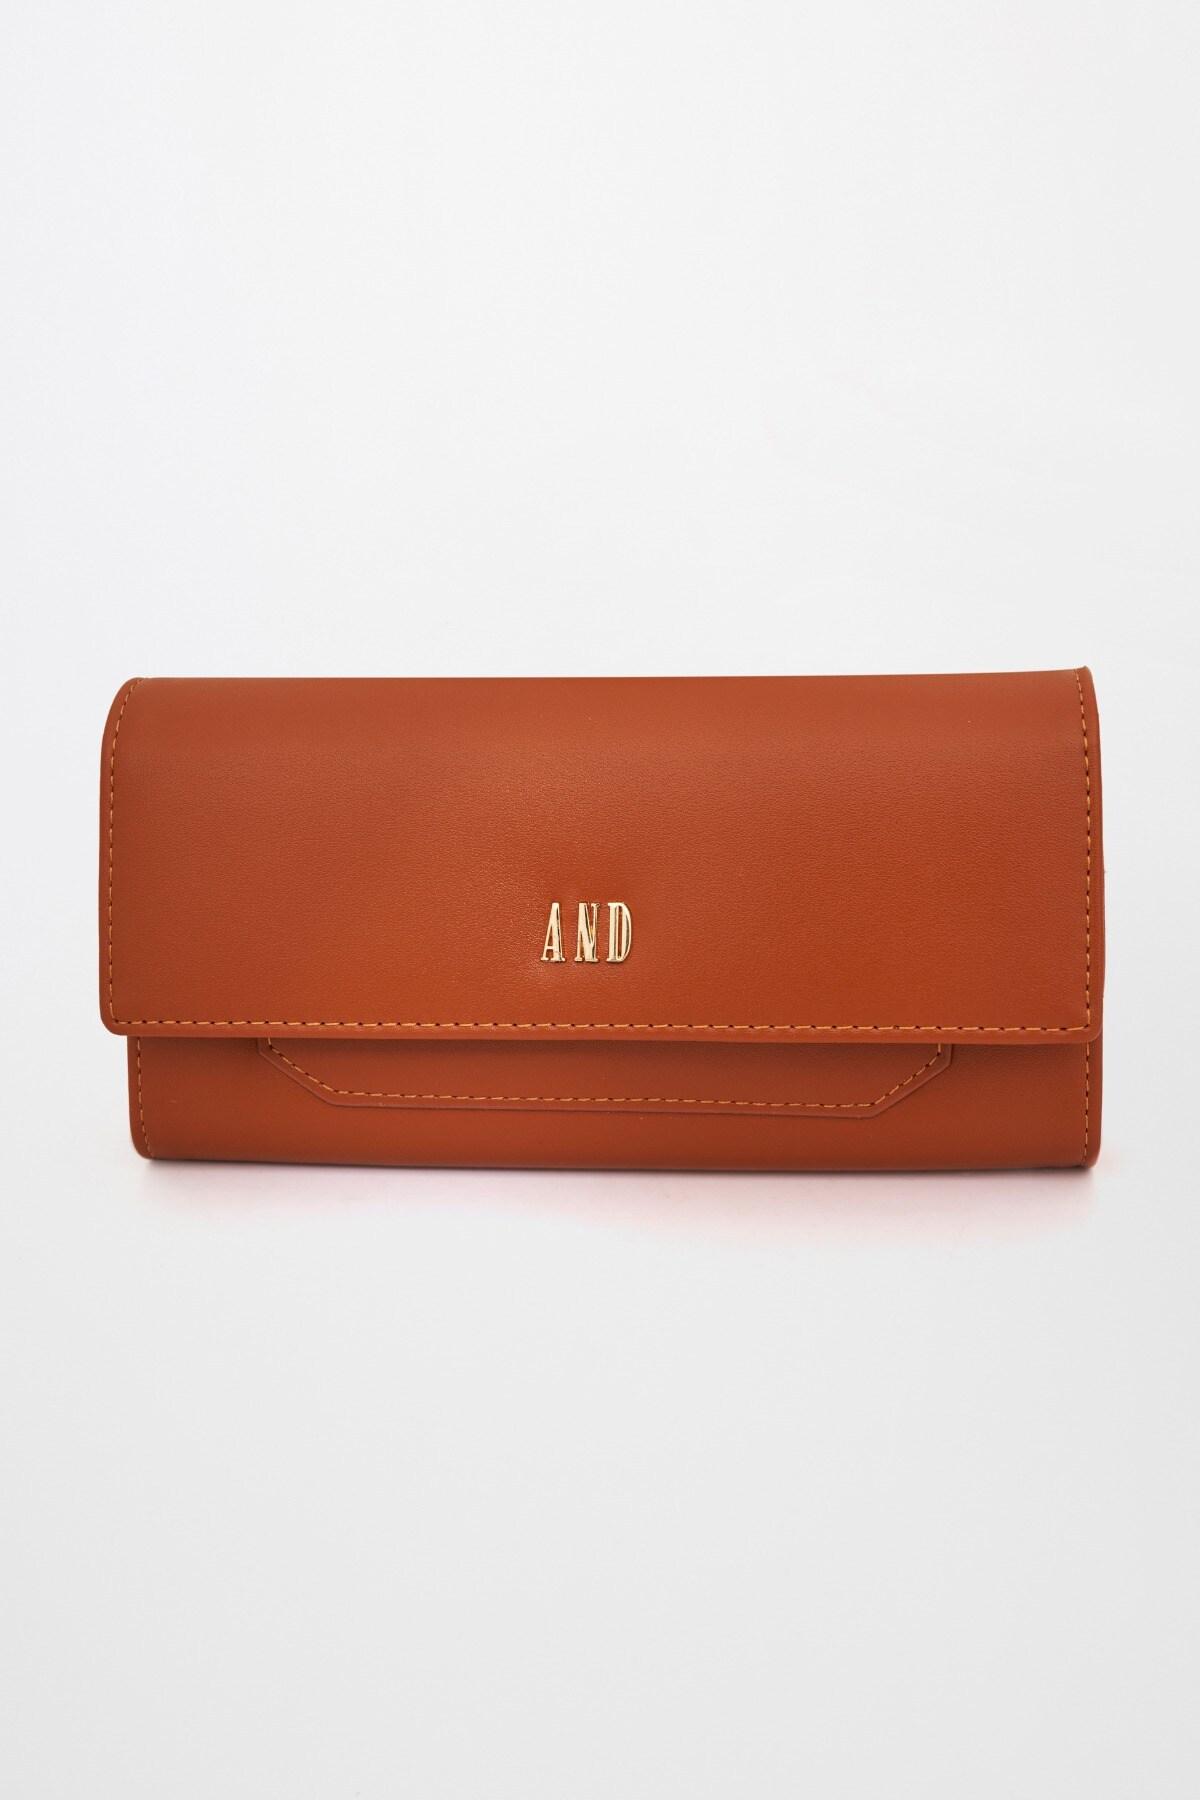 AND | Tan Wallet